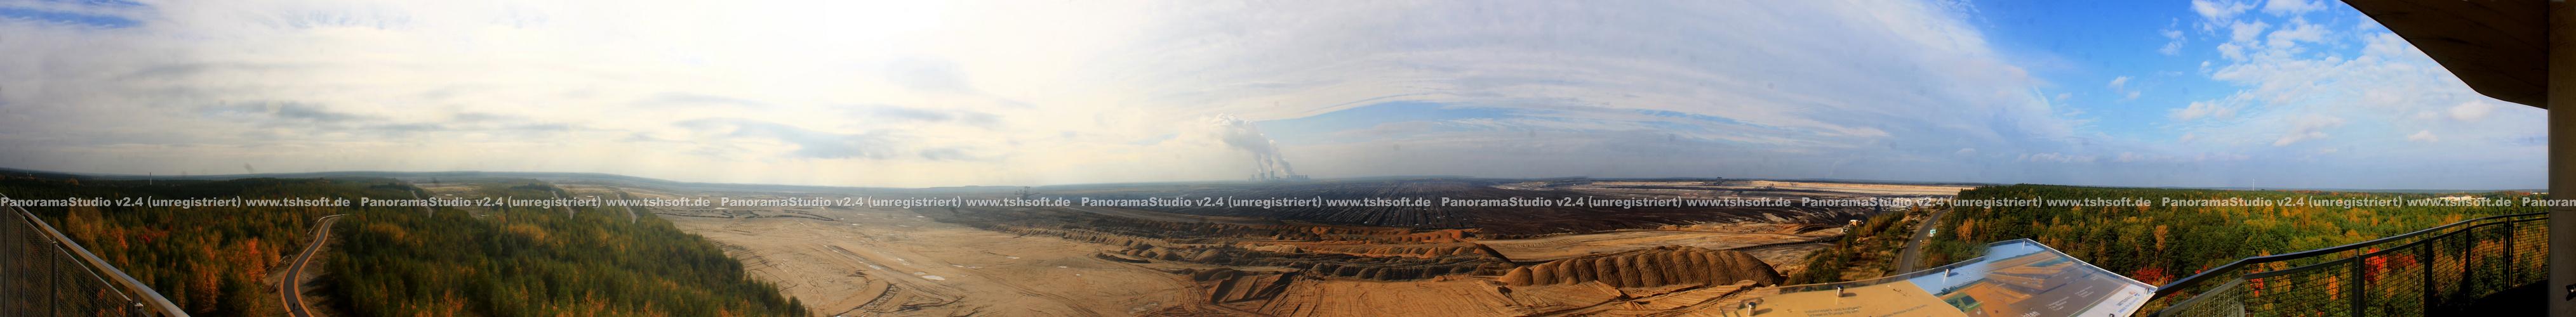 Panoramabild Tagebau Nochten